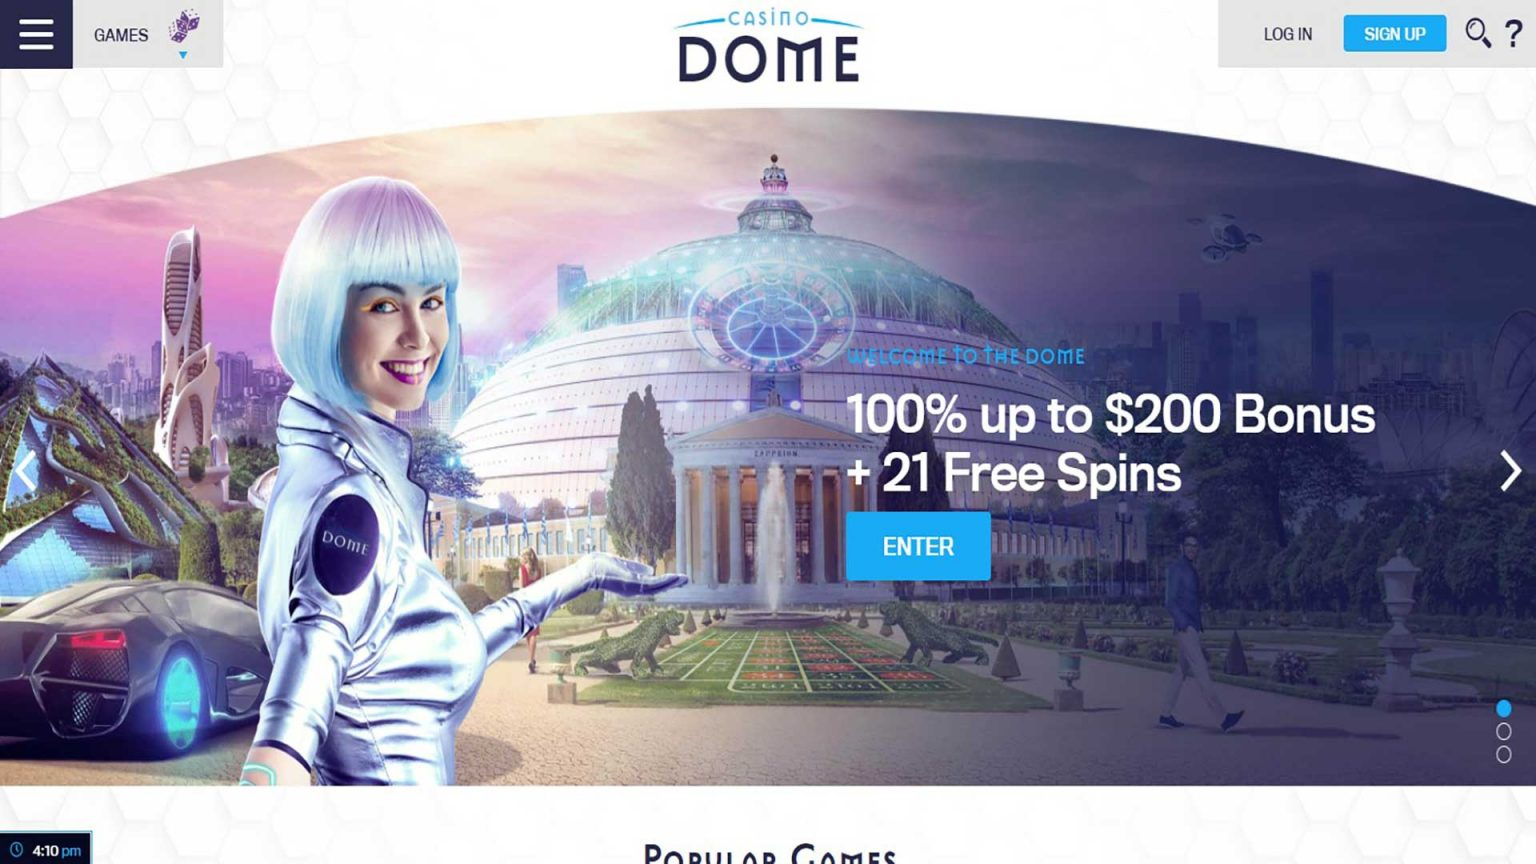 Casino Dome Screenshot